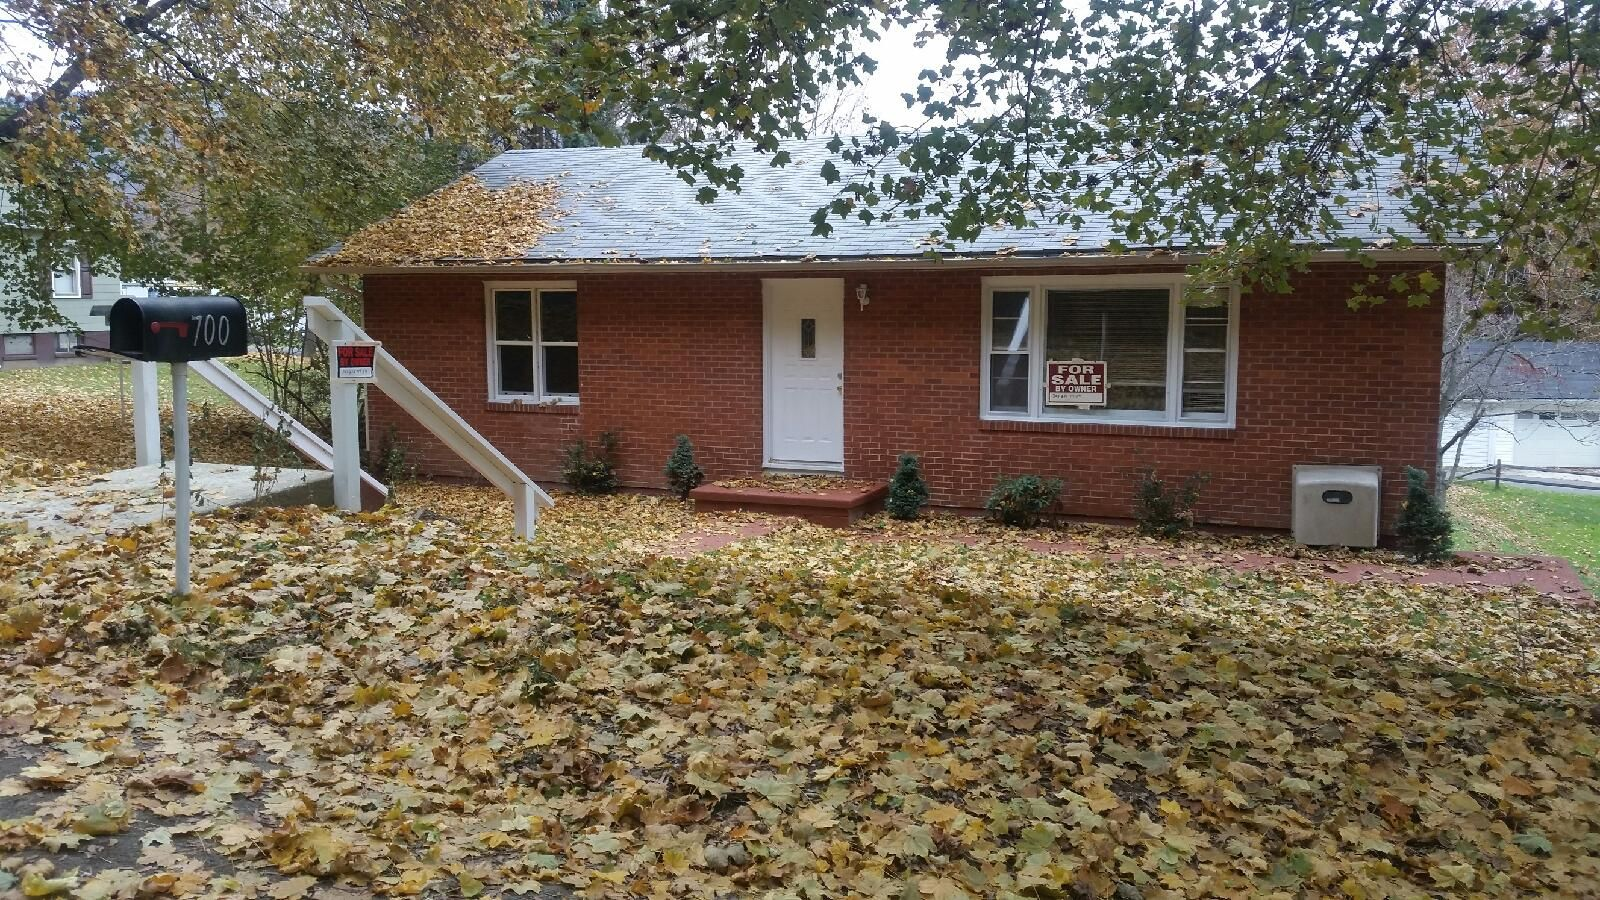 700 W Piedmont St, Keyser, WV 26726 | Trulia